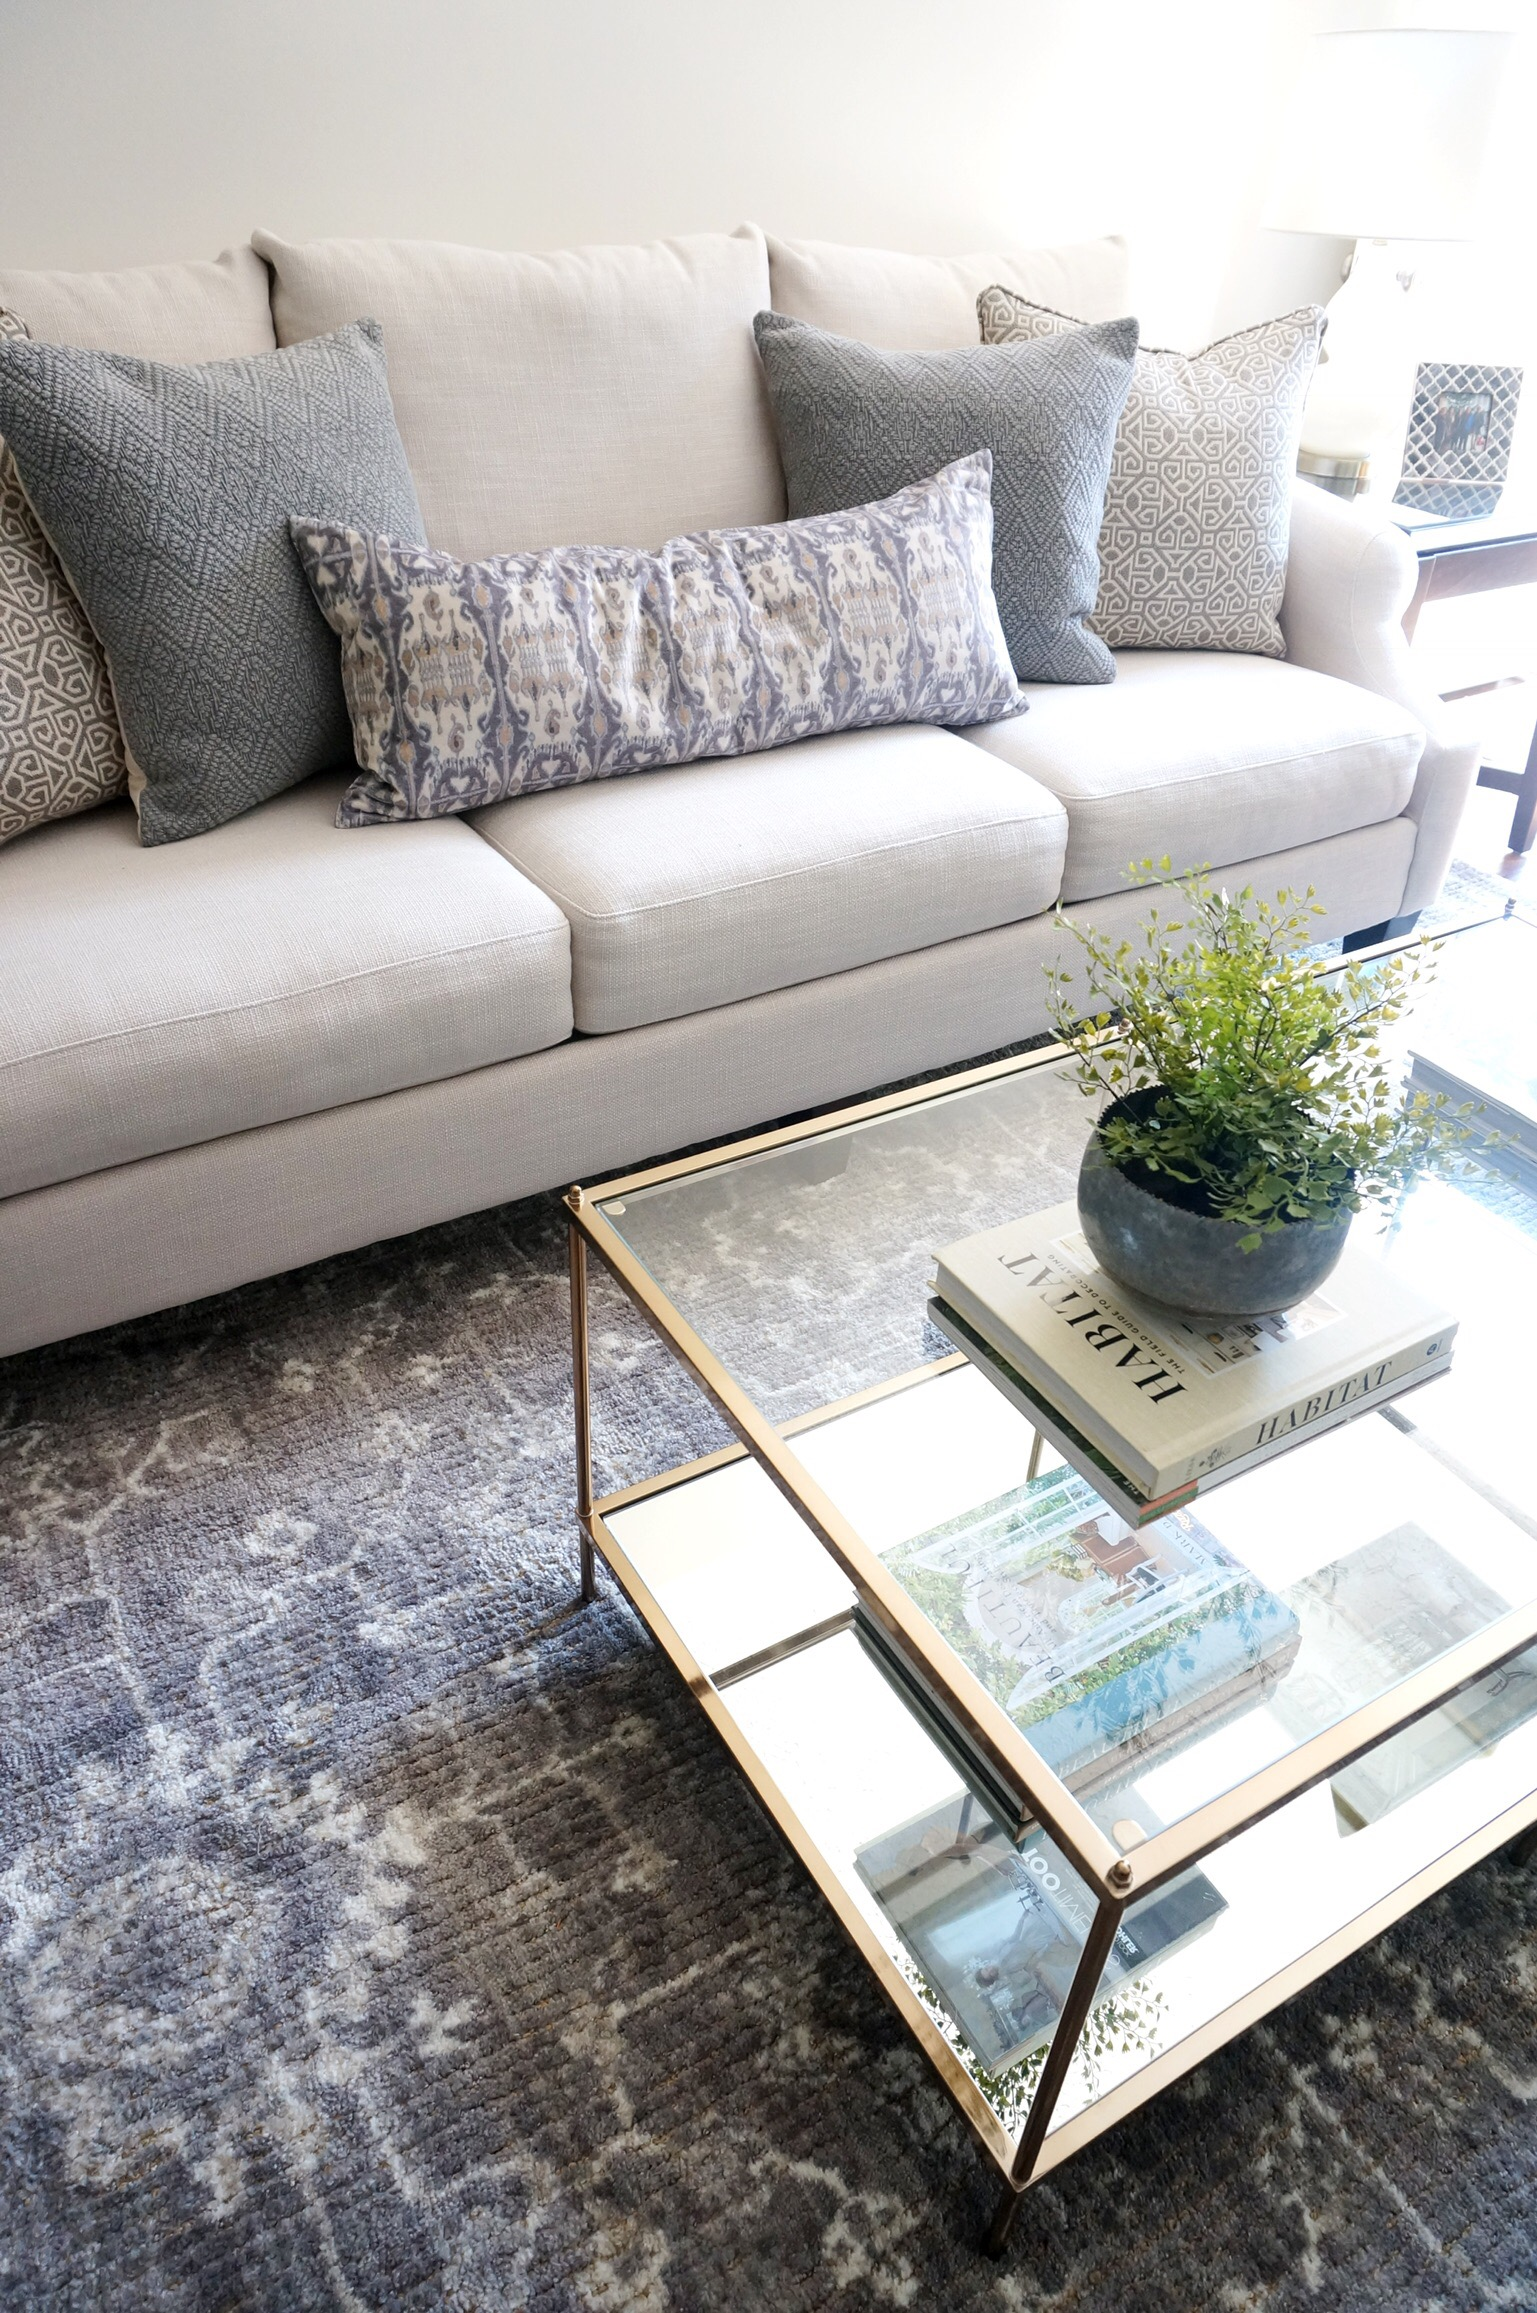 Studio-Chu-Waverly-Residence-Living-Room-2.jpg